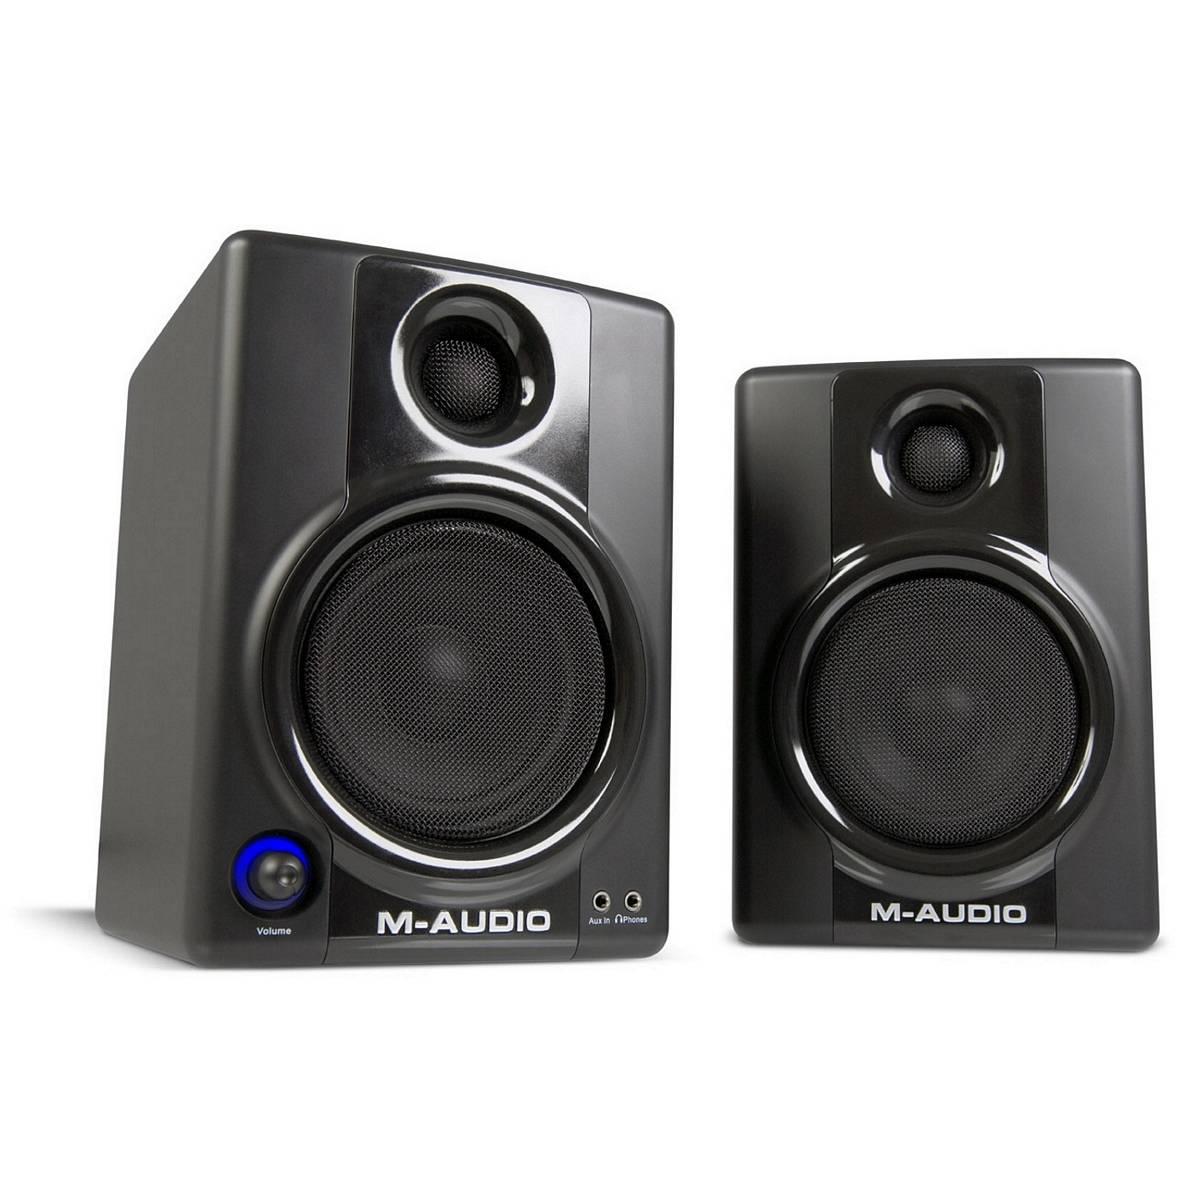 m audio av40 studio monitors v2 pair monitoring from inta audio uk. Black Bedroom Furniture Sets. Home Design Ideas